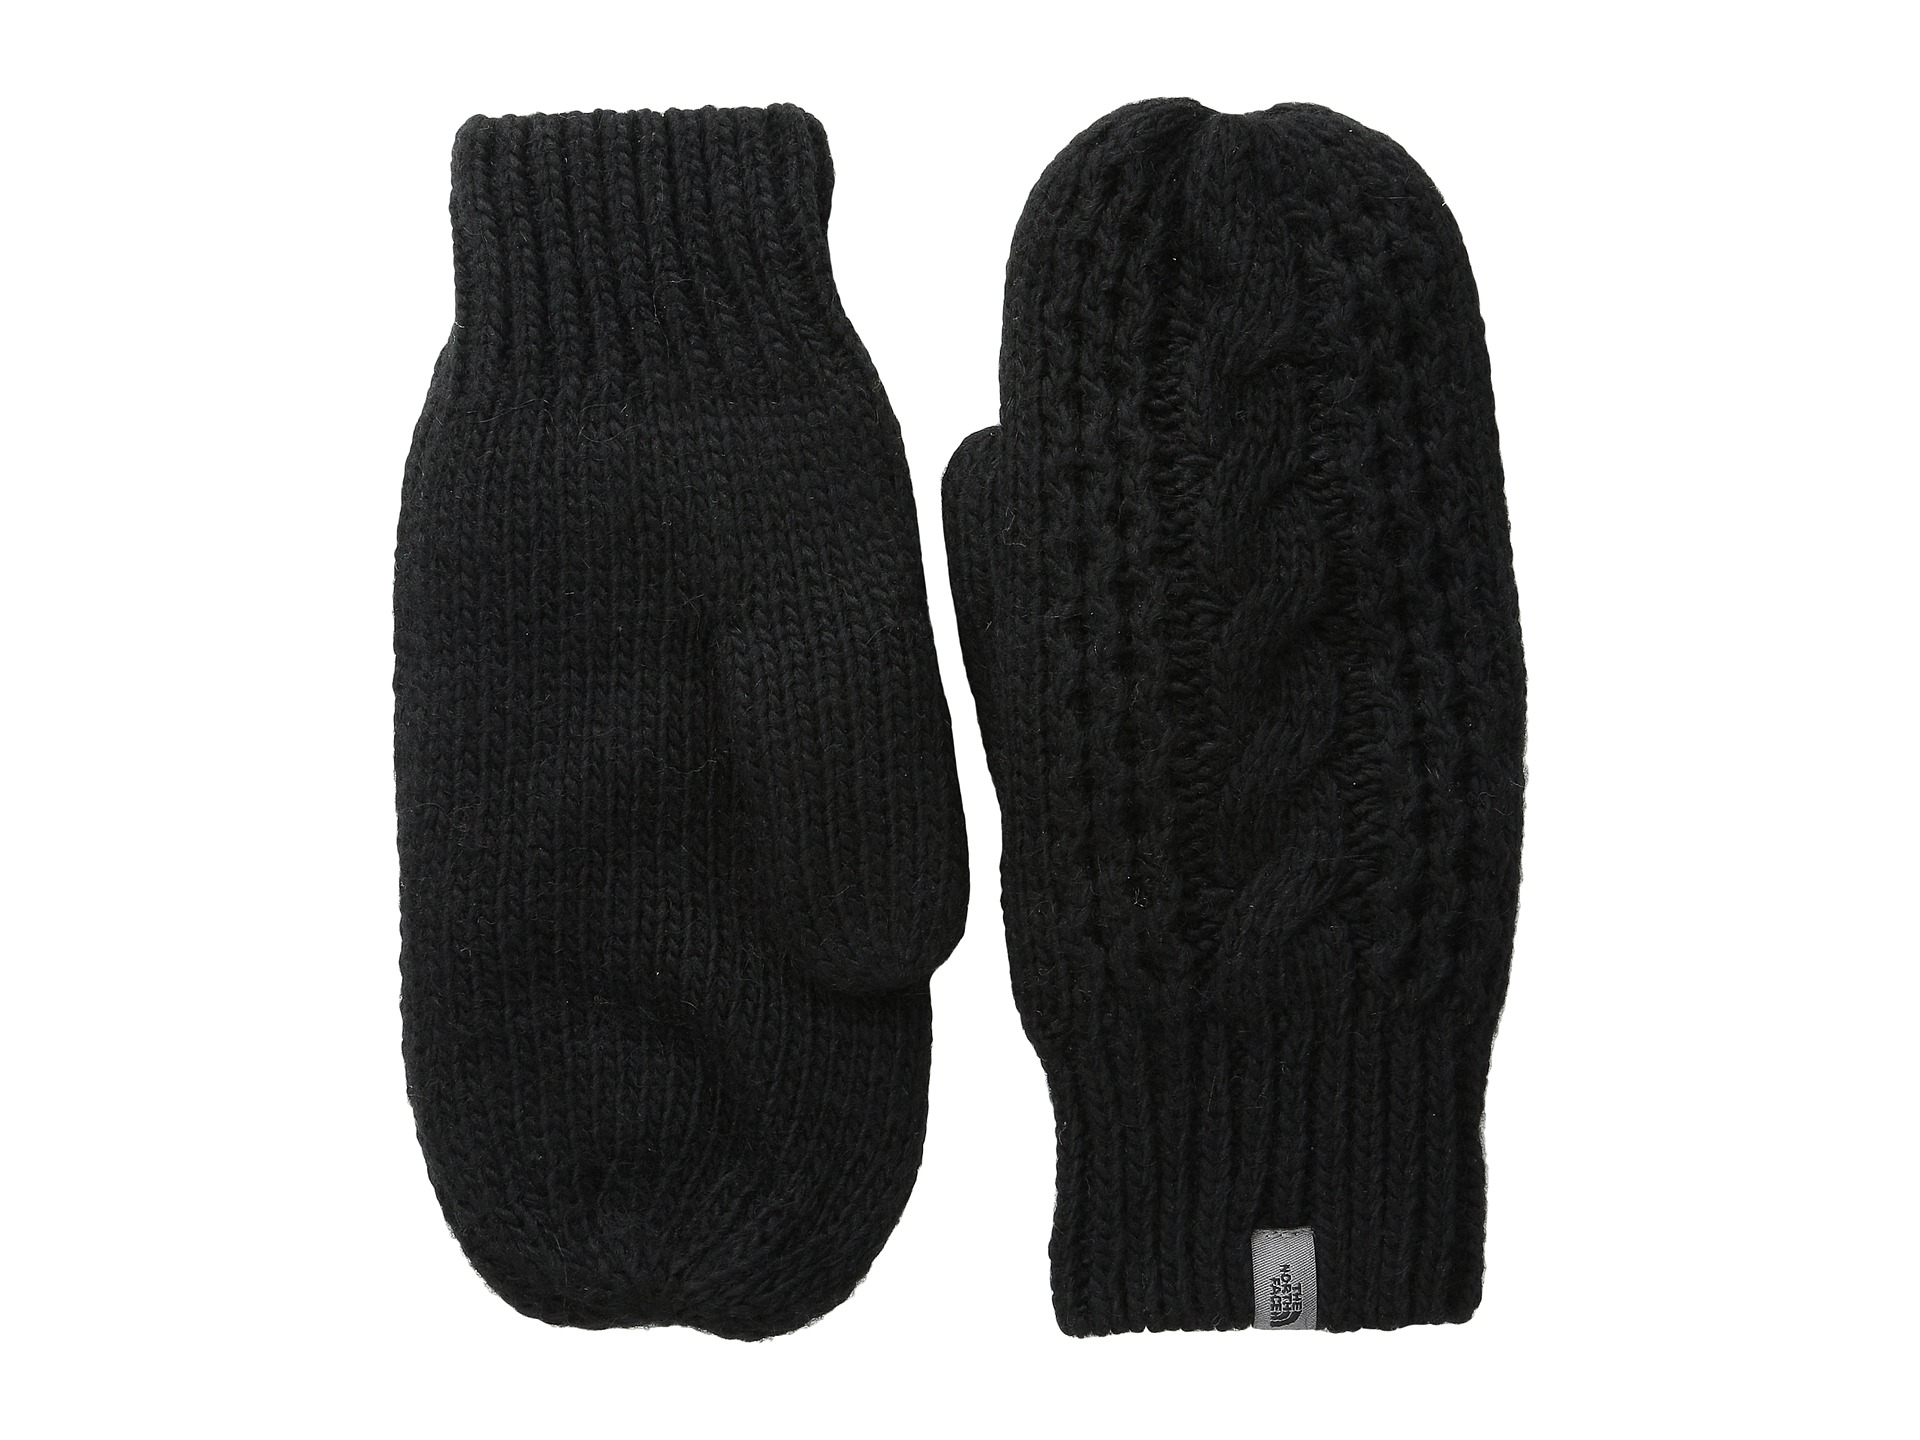 Knit Mittens With Fleece Lining Pattern - Long Sweater Jacket